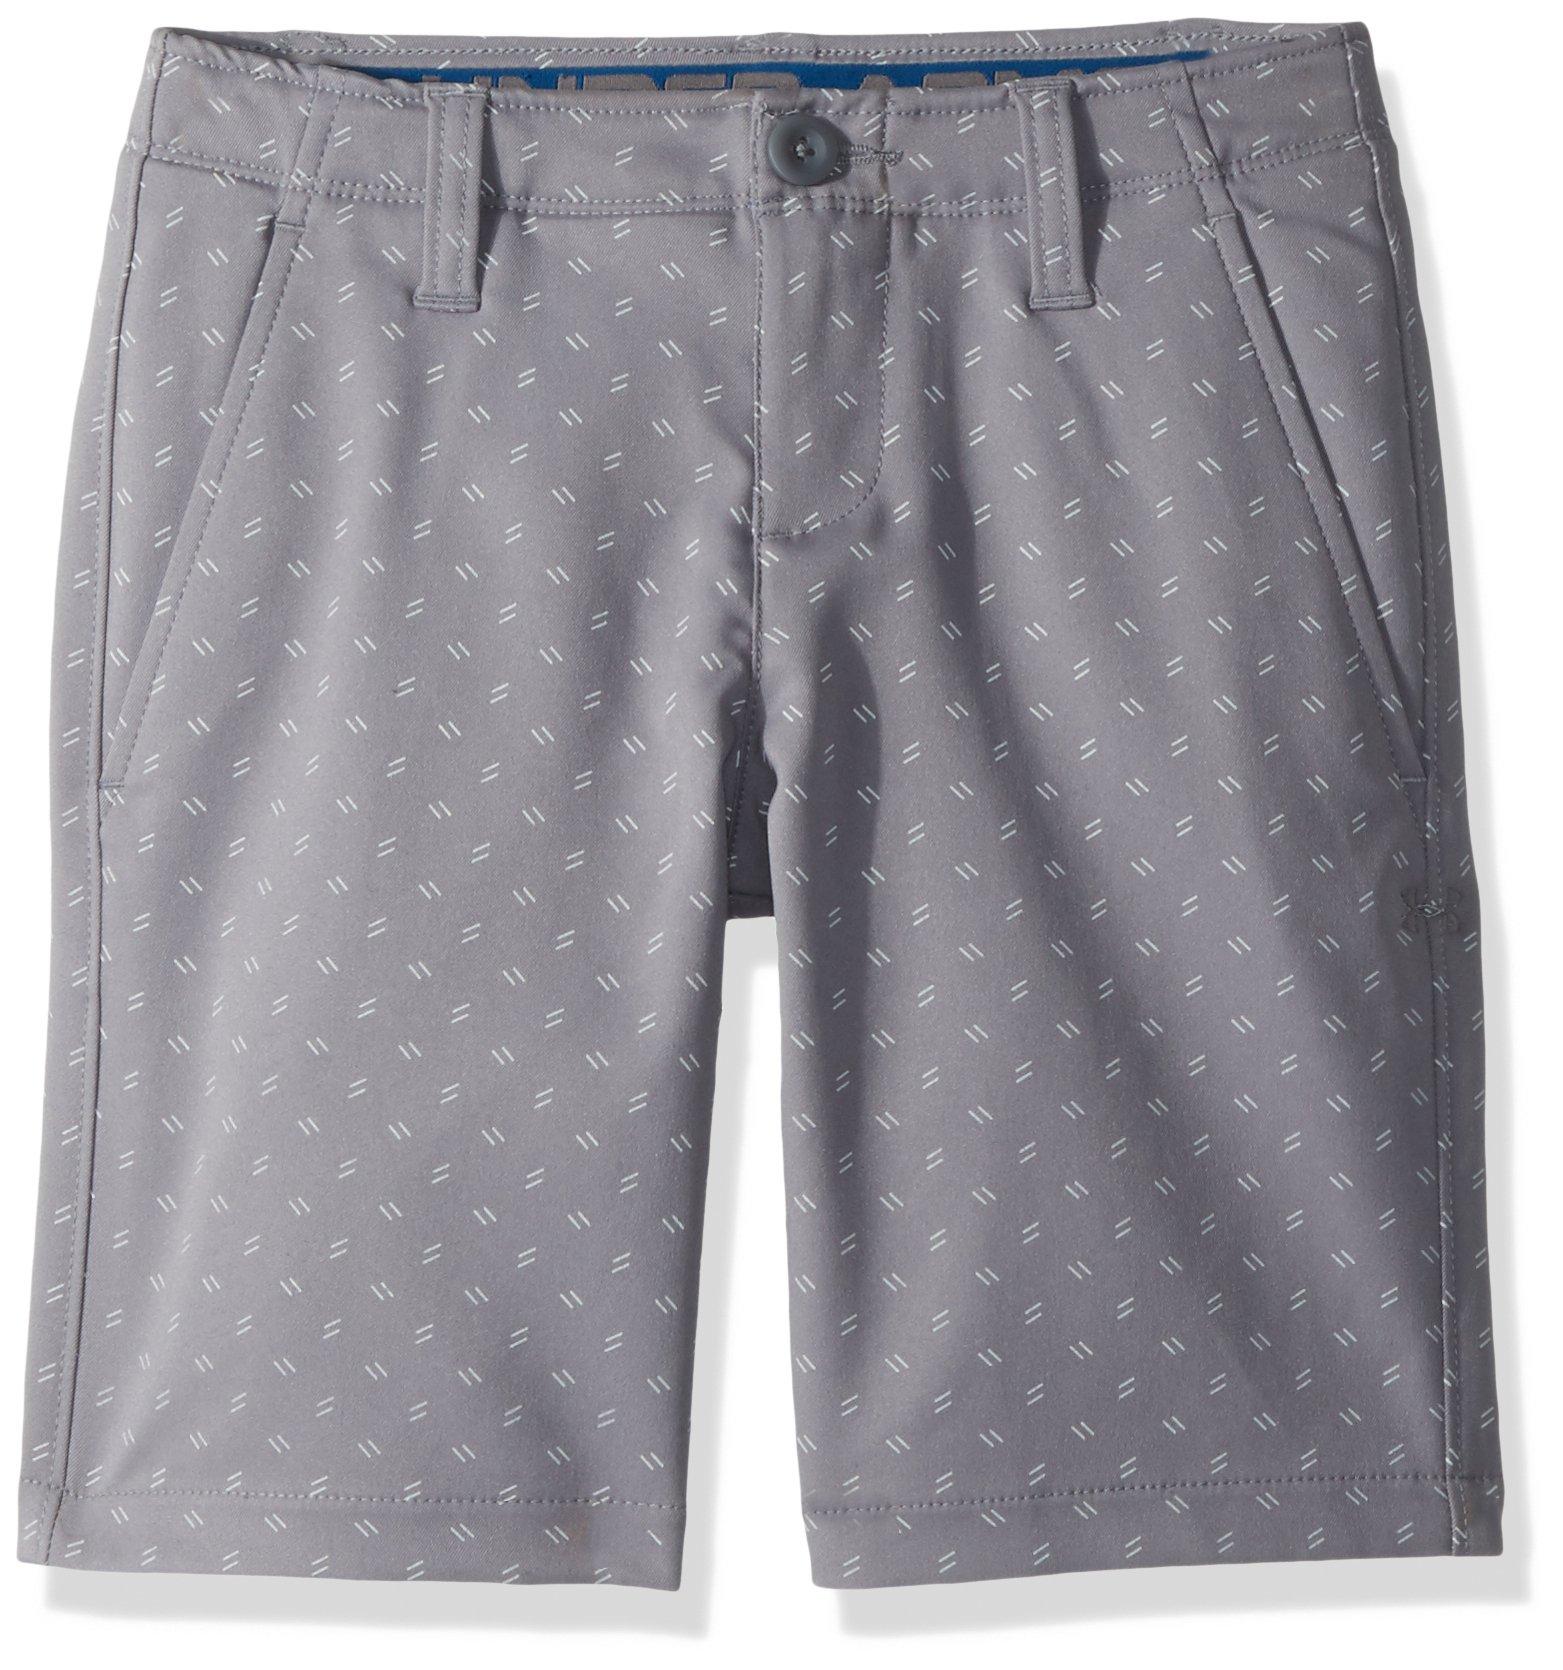 Under Armour Boys' Match Play Printed Shorts, Zinc Gray (513)/Zinc Gray,10